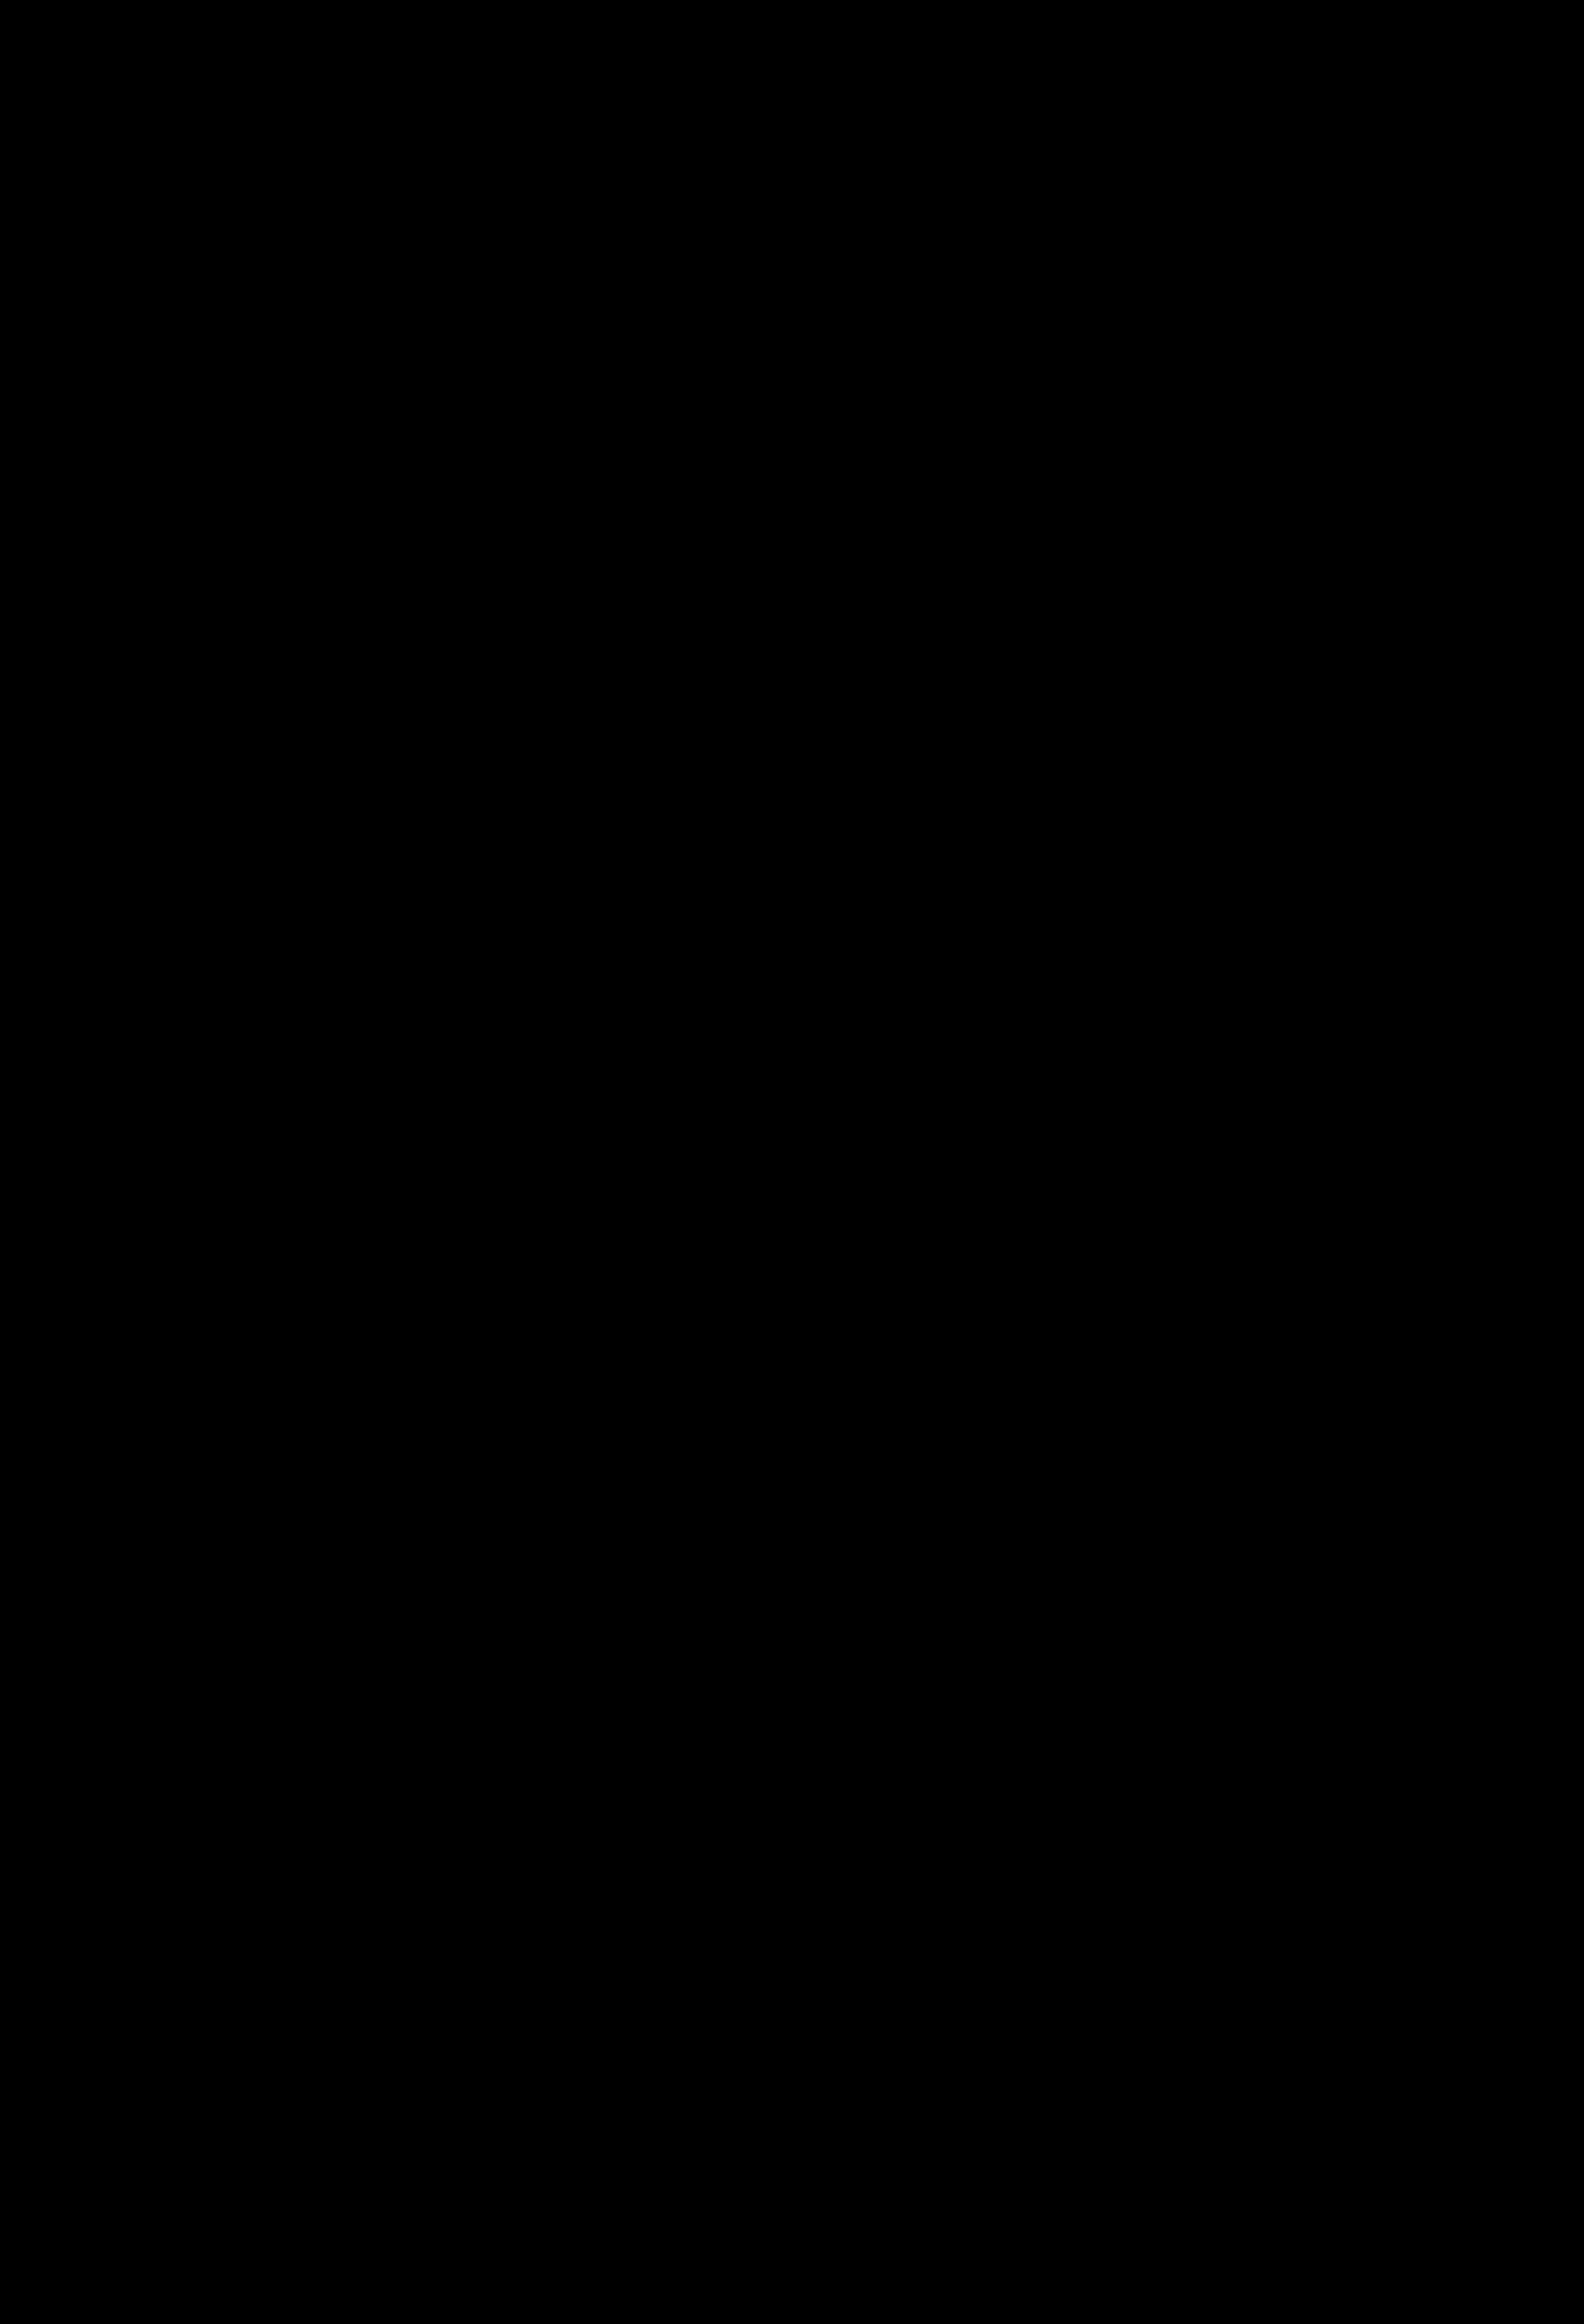 Exercising SVG Clip arts